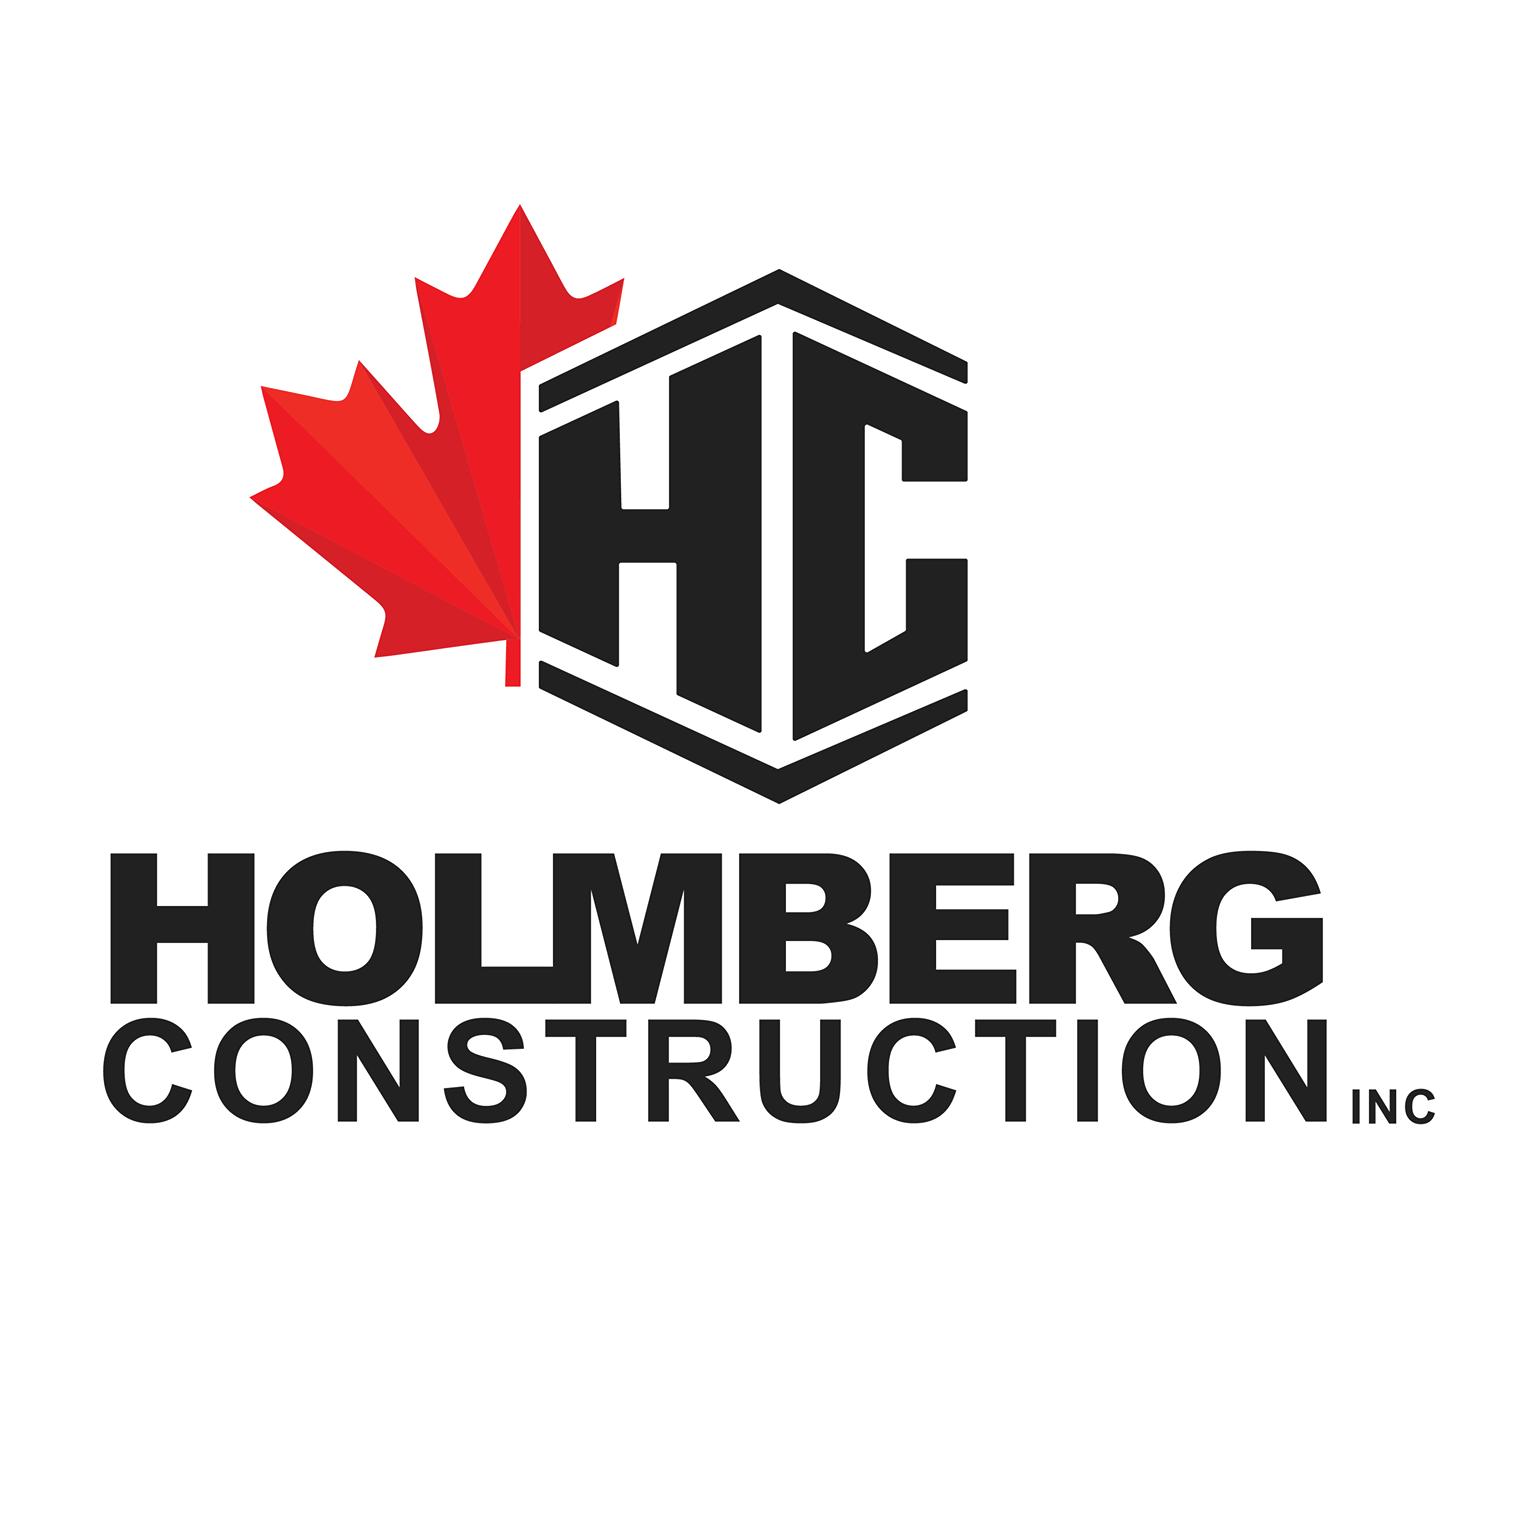 Holmberg Construction Inc logo